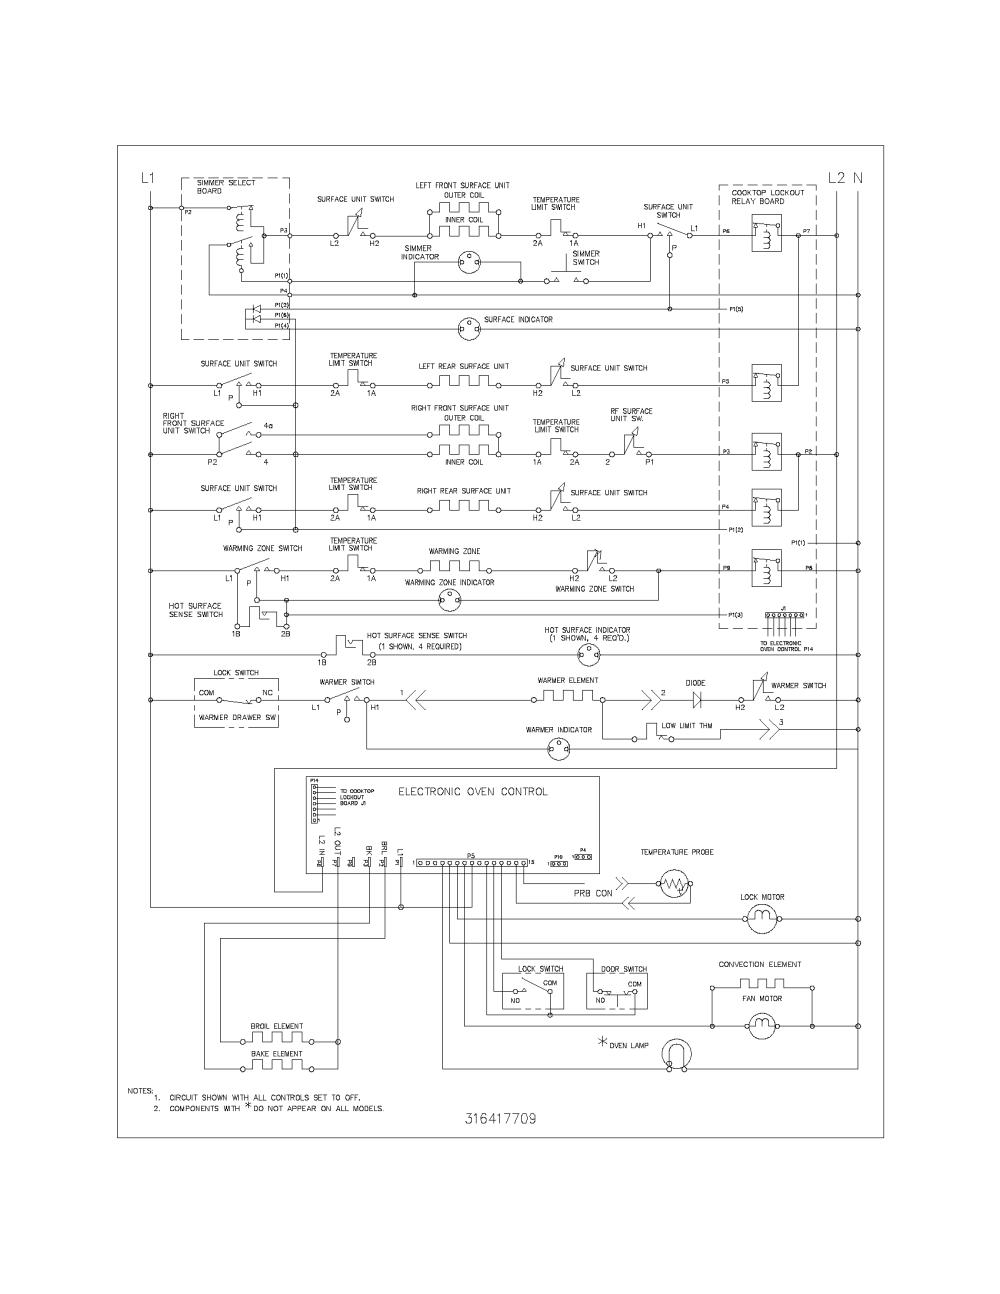 medium resolution of 79096612400 electric range wiring schematic parts diagram